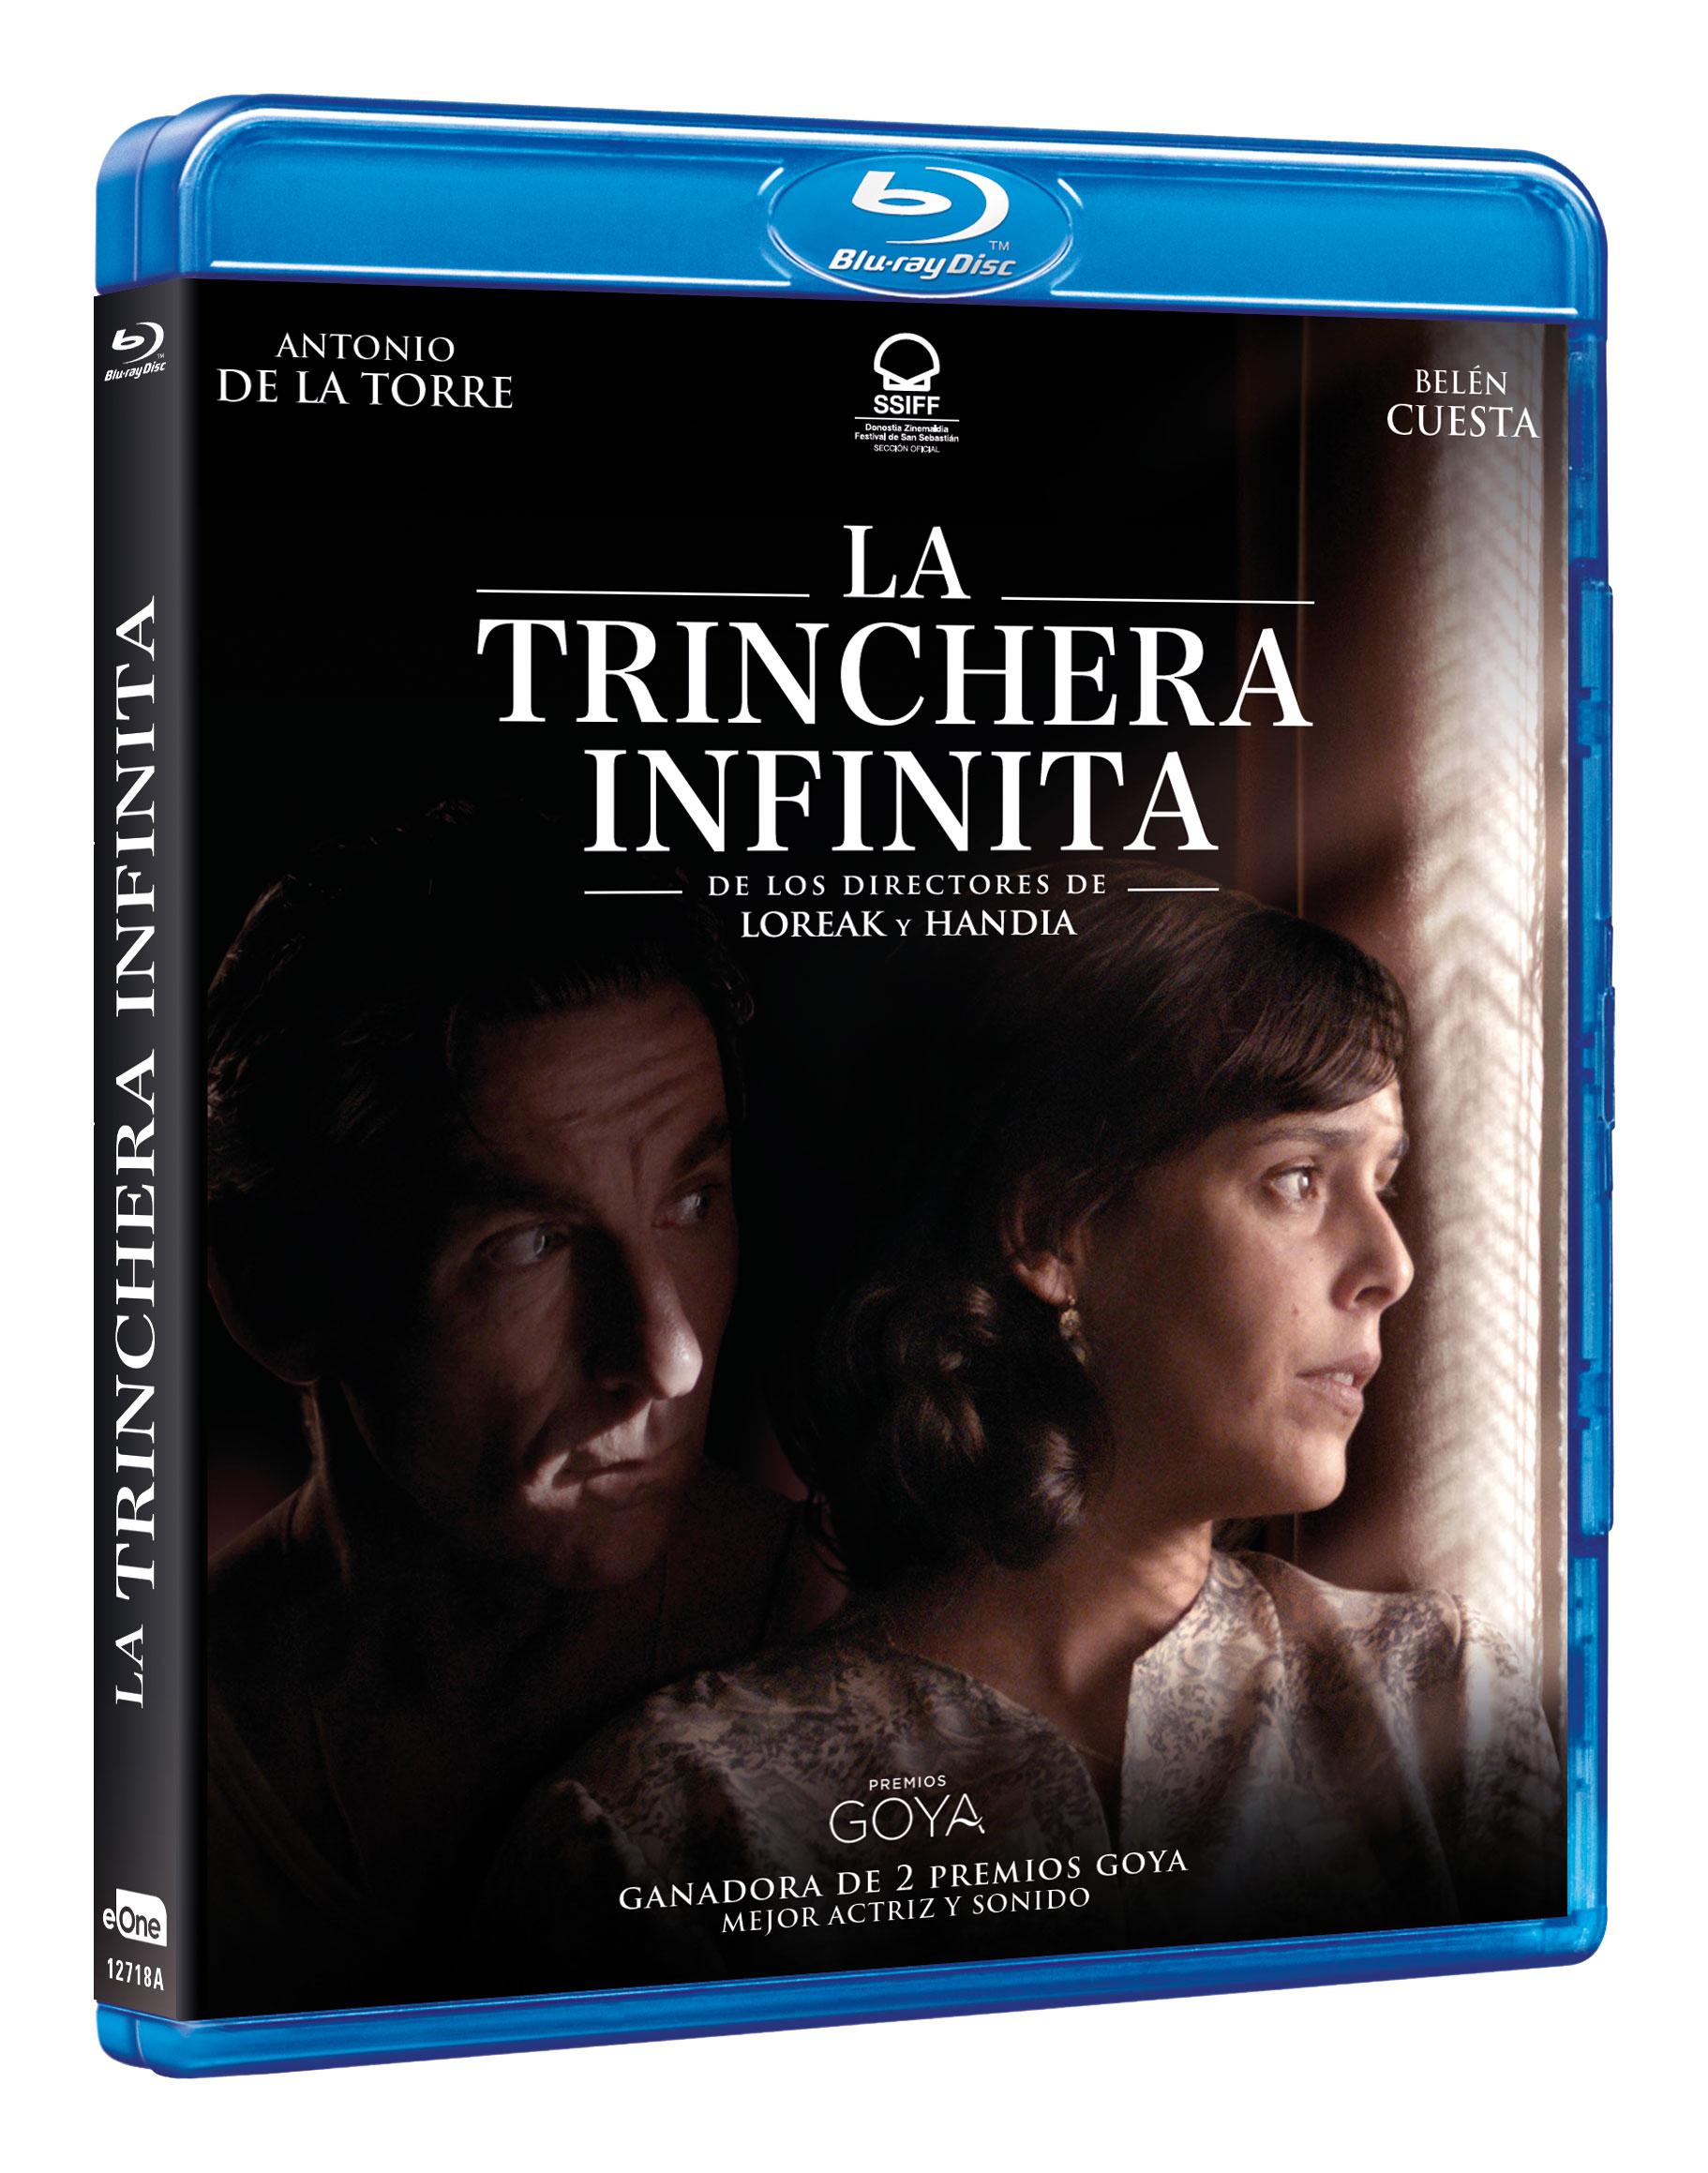 'La Trinchera Infinita', ya en DVD y Blu-ray